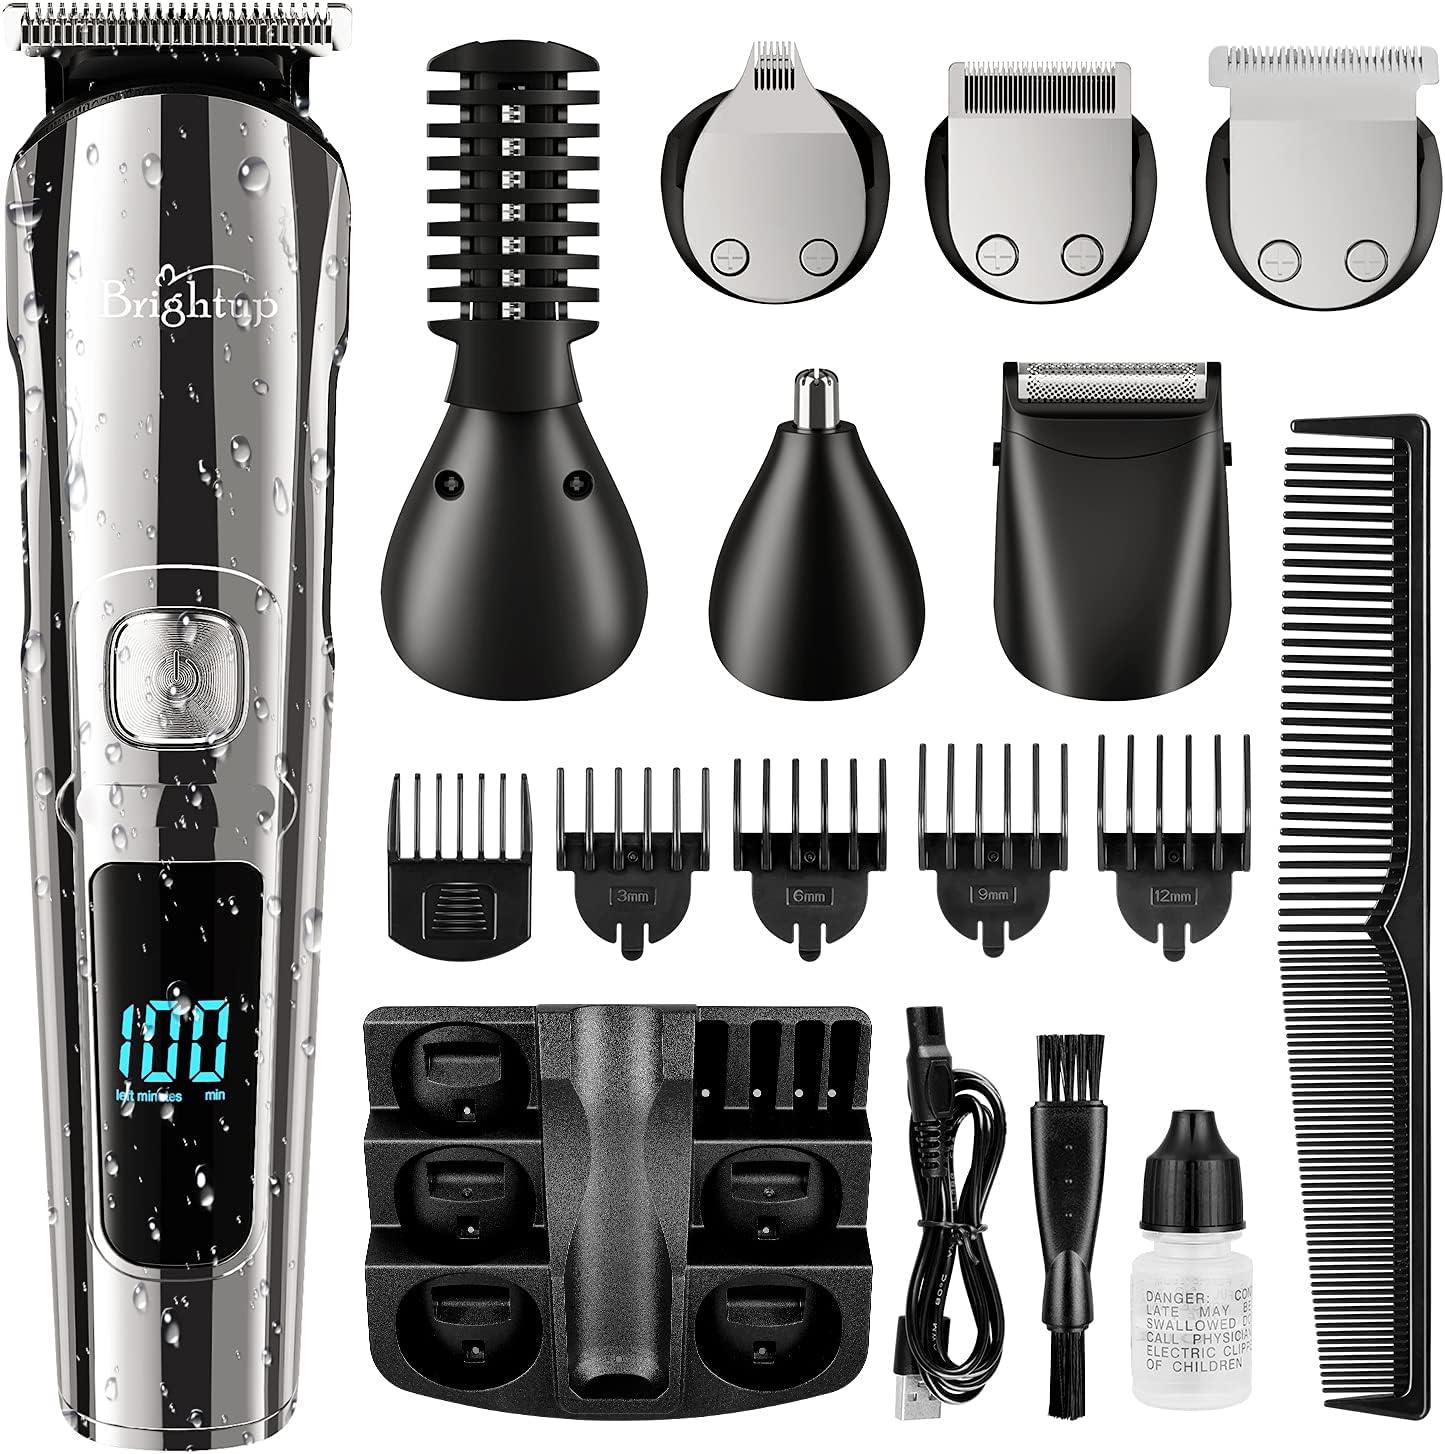 Brightup Cordless Hair Clippers Hair/ Beard Trimmer